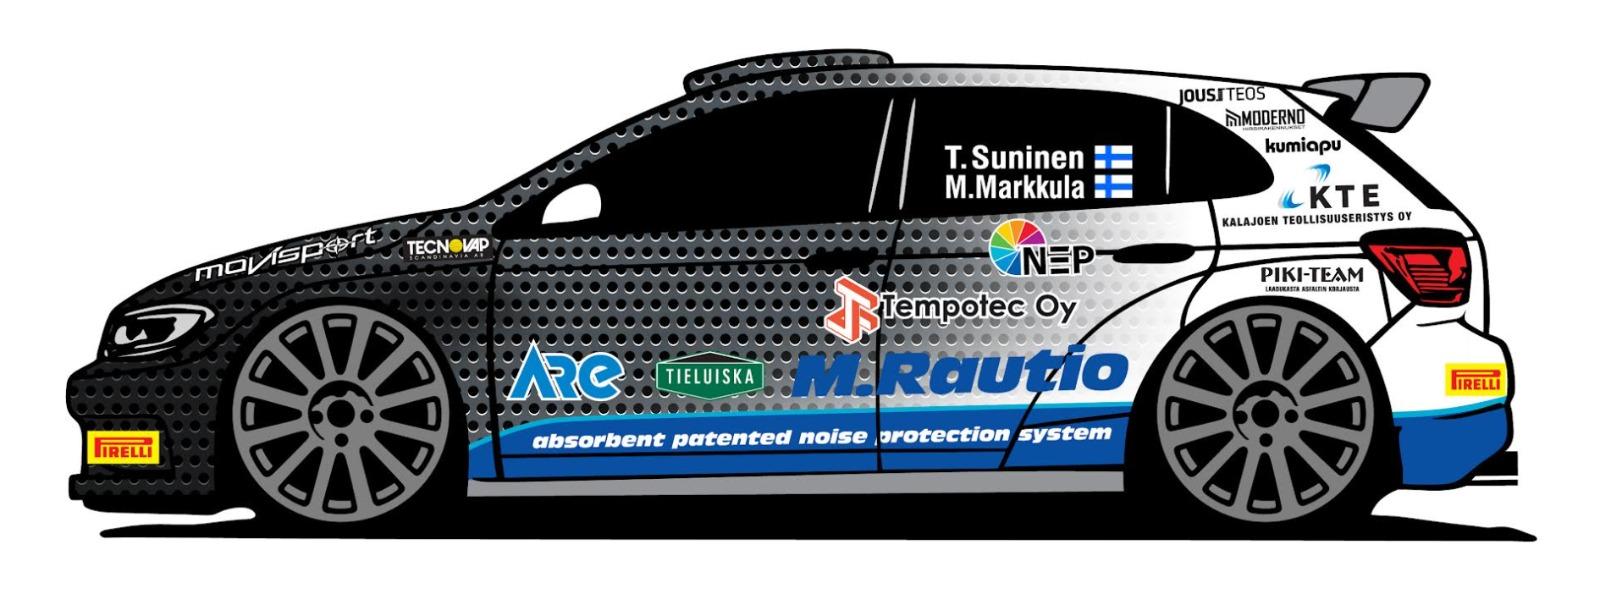 World Rally Championship: Temporada 2021  - Página 34 E-S_I01XMAYDqwM?format=jpg&name=large